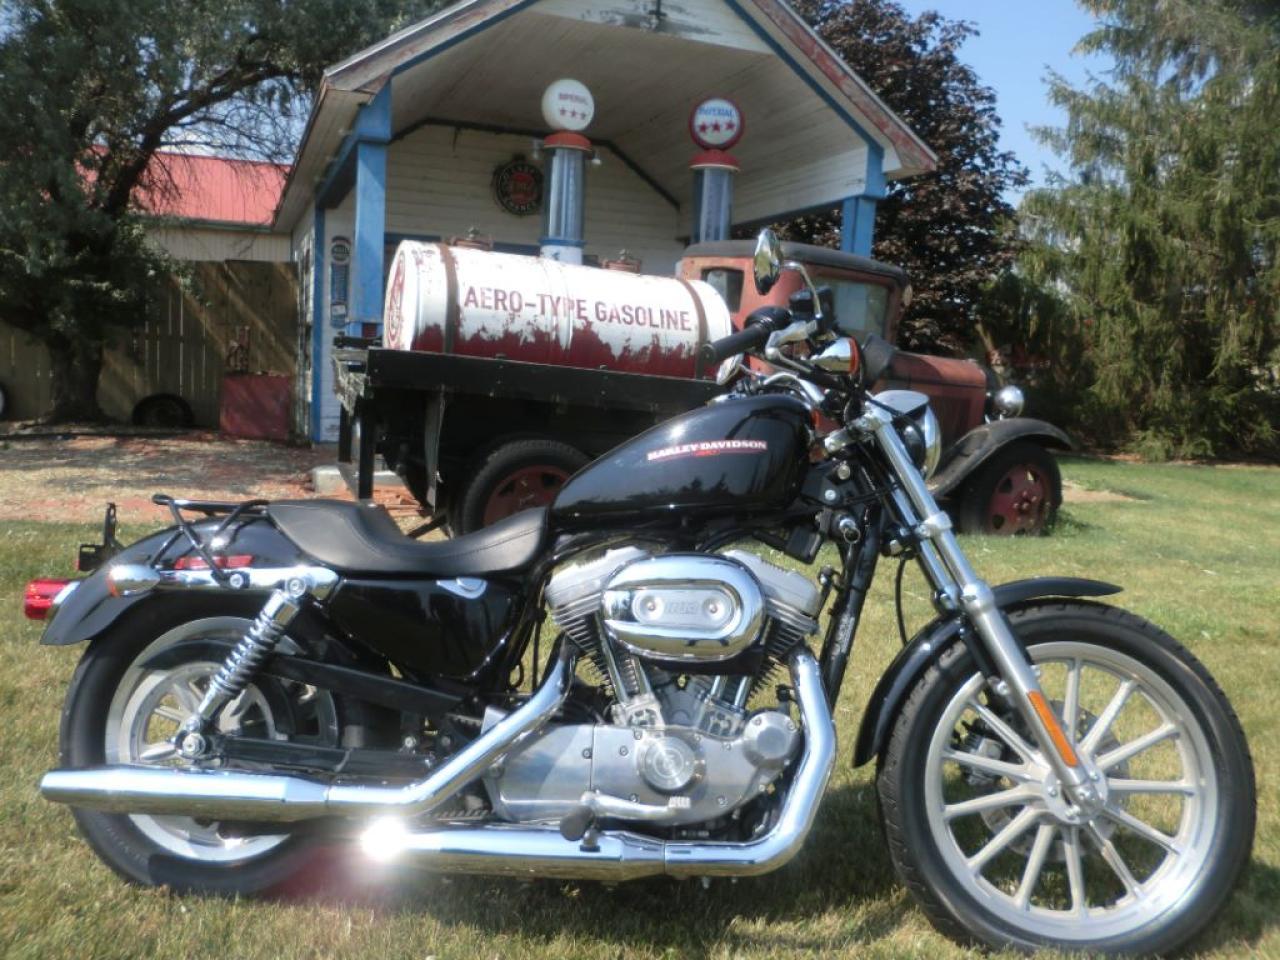 2005 Harley-Davidson Sportster 883 XL 883 LOW